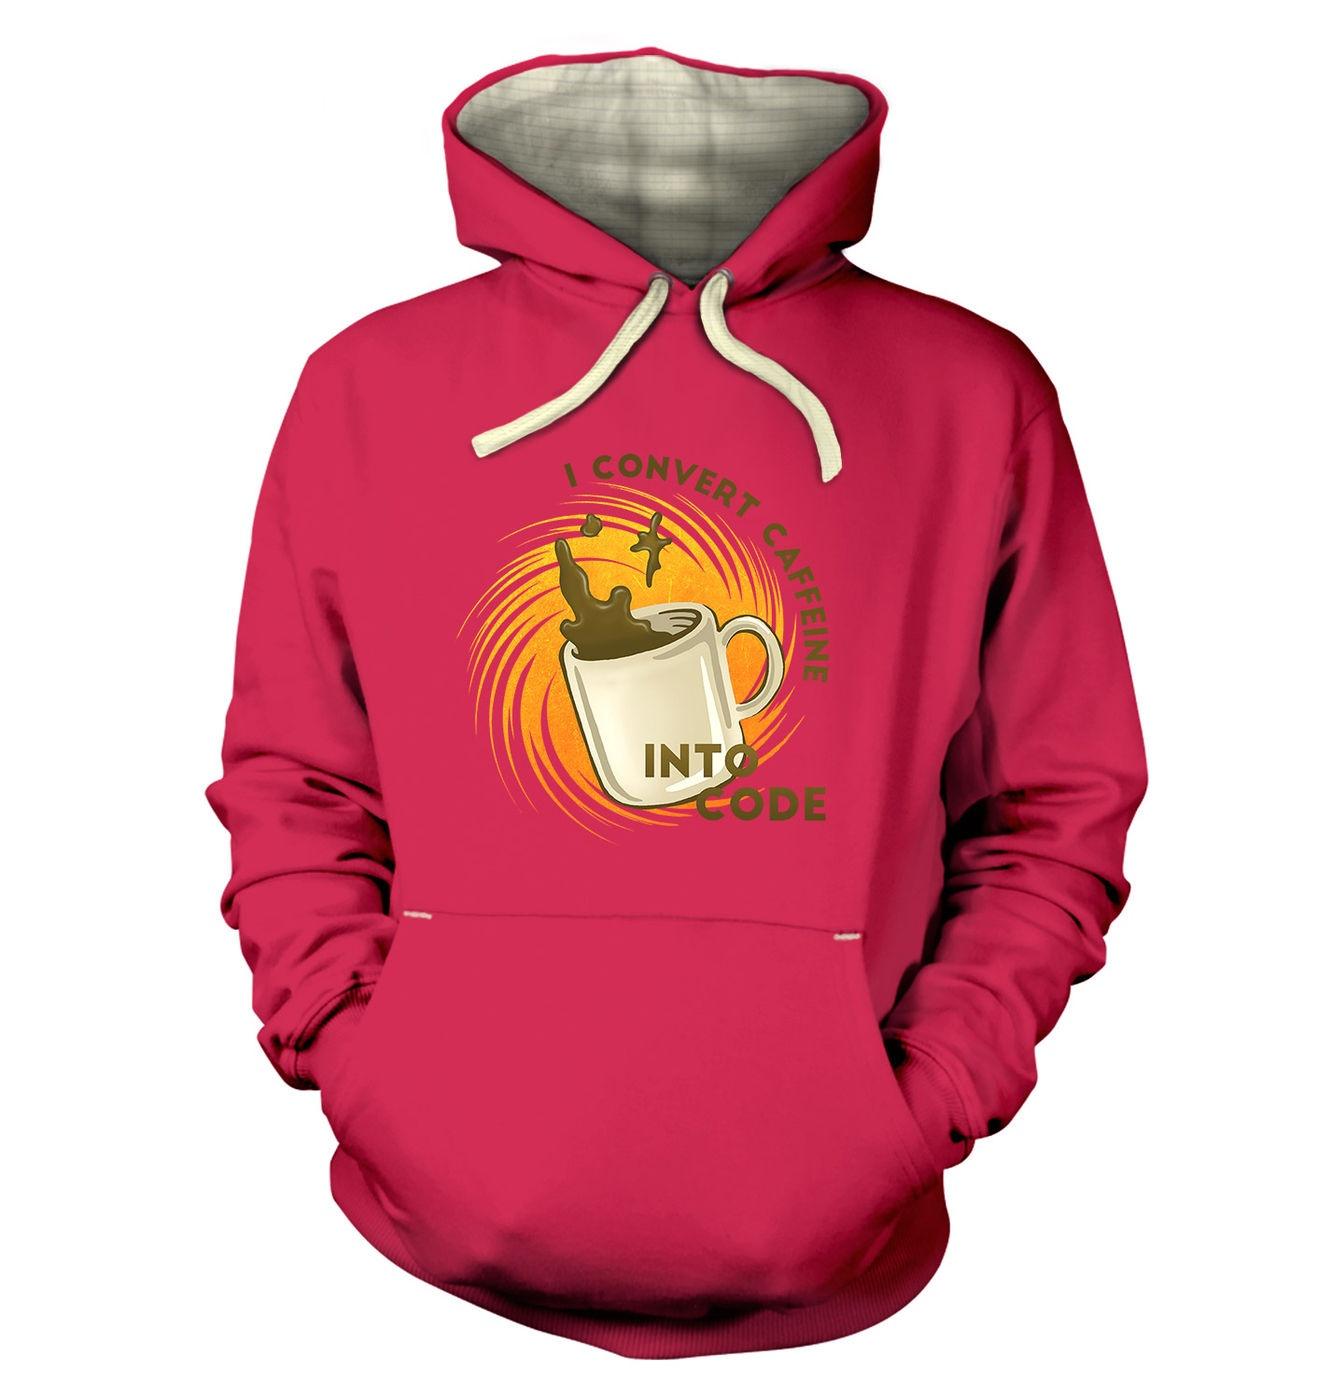 Convert Caffeine Into Code premium hoodie by Something Geeky